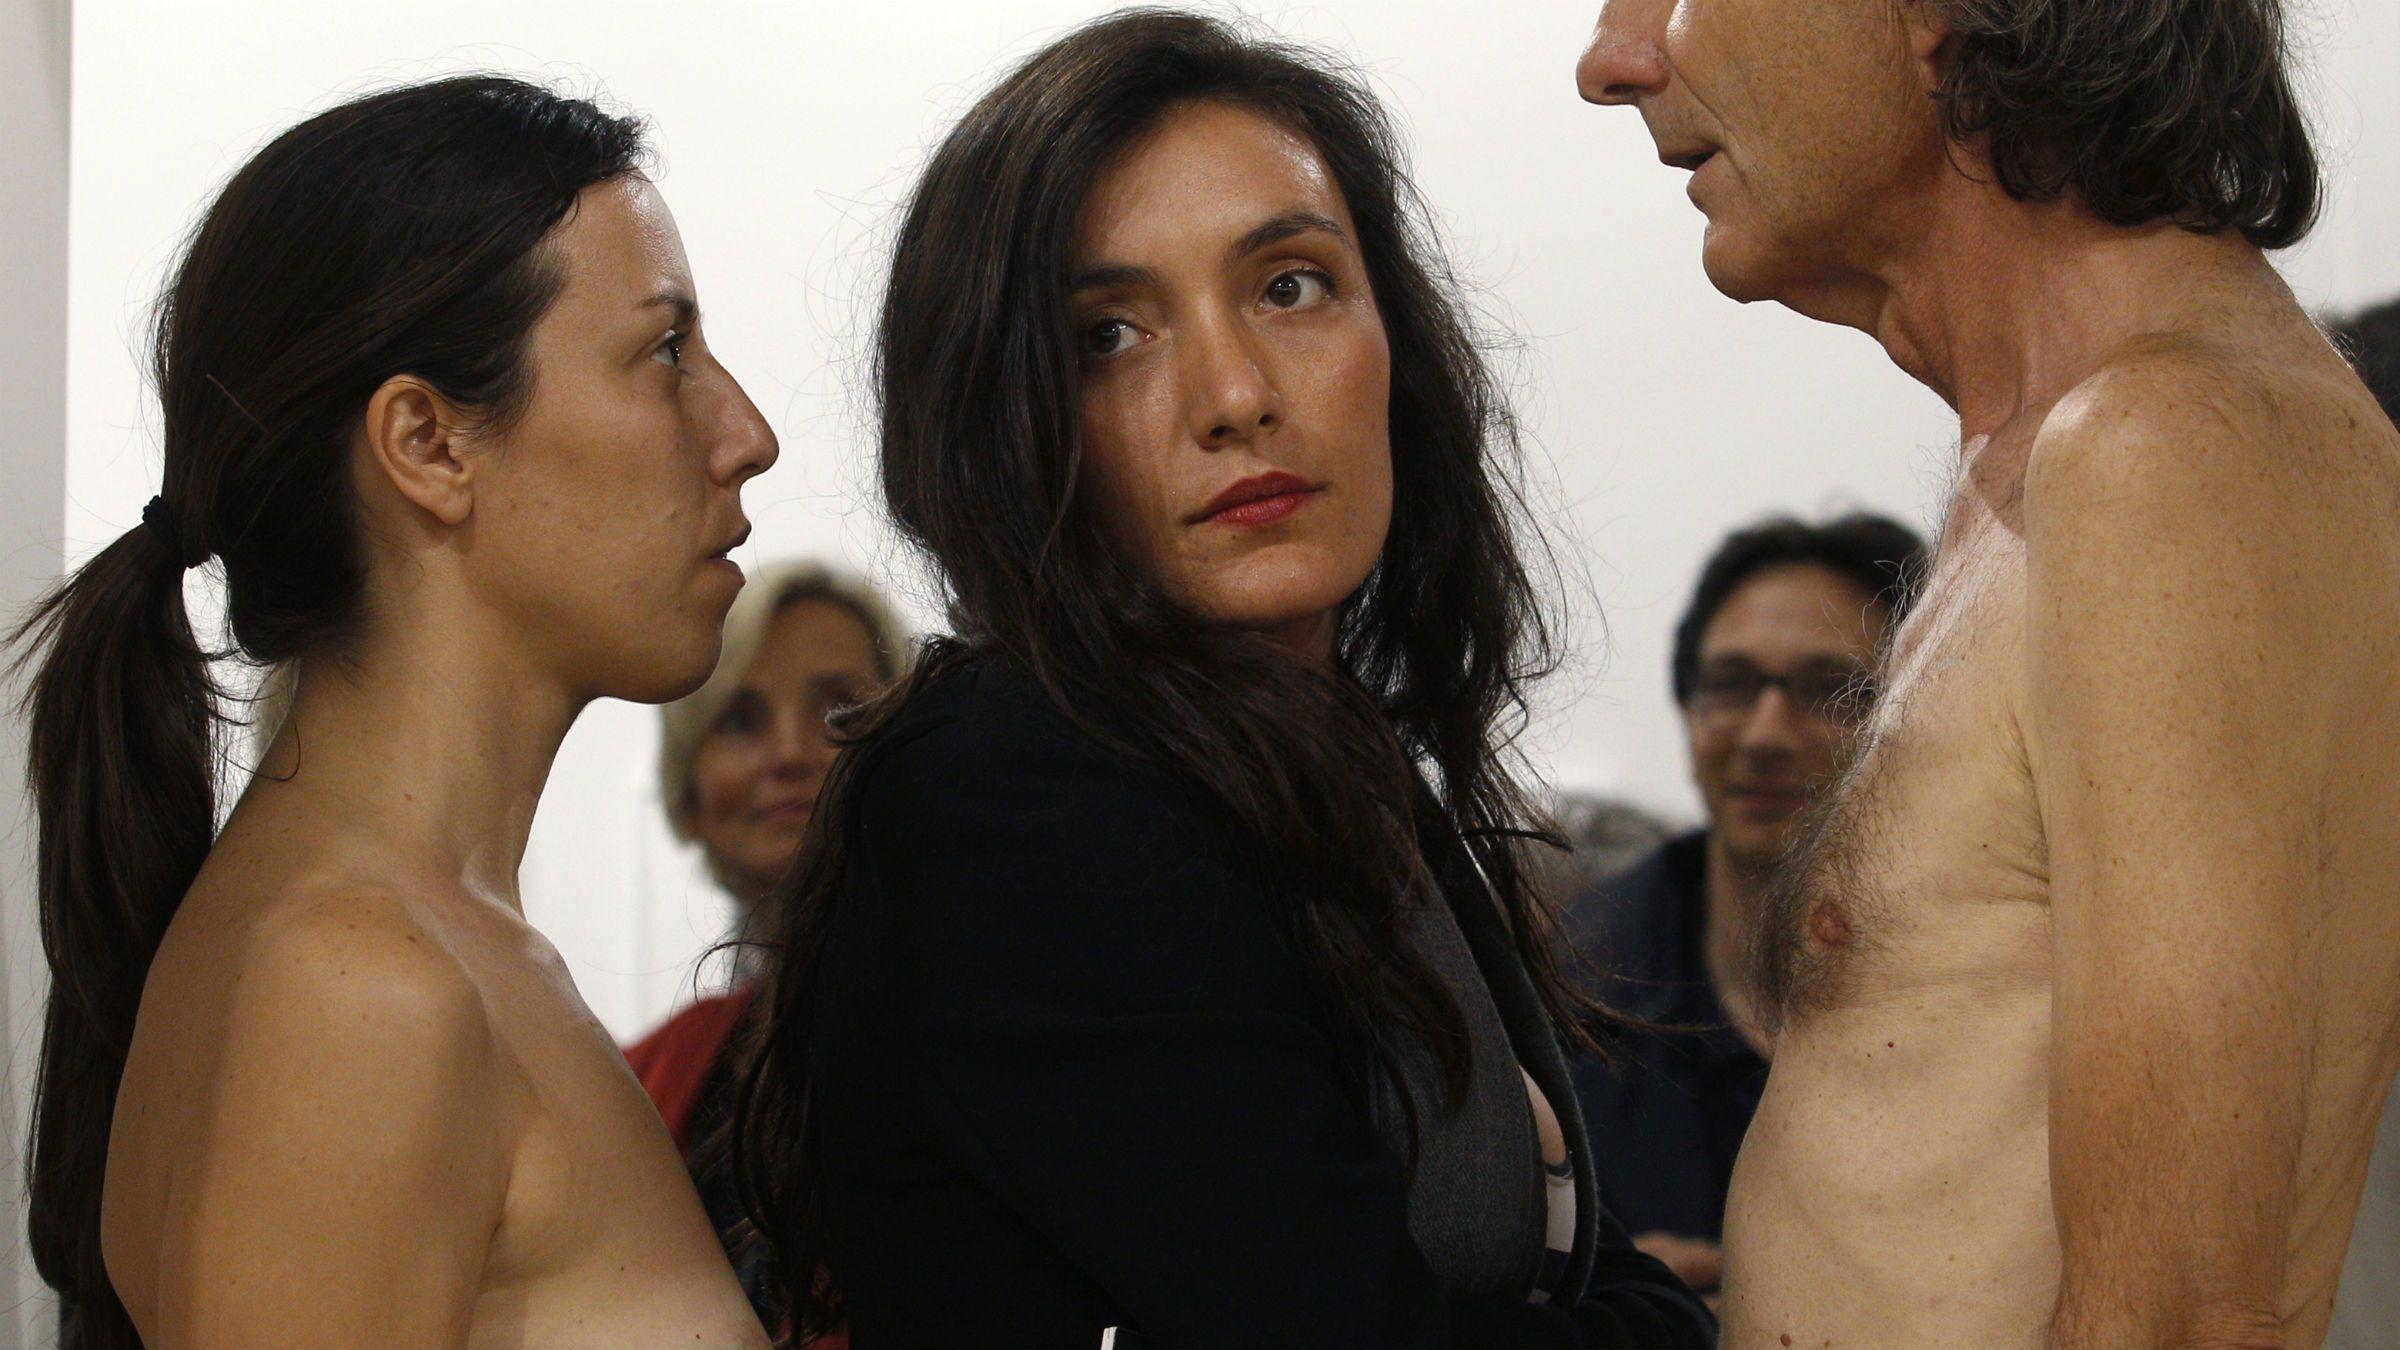 Marina Abramovic staring show